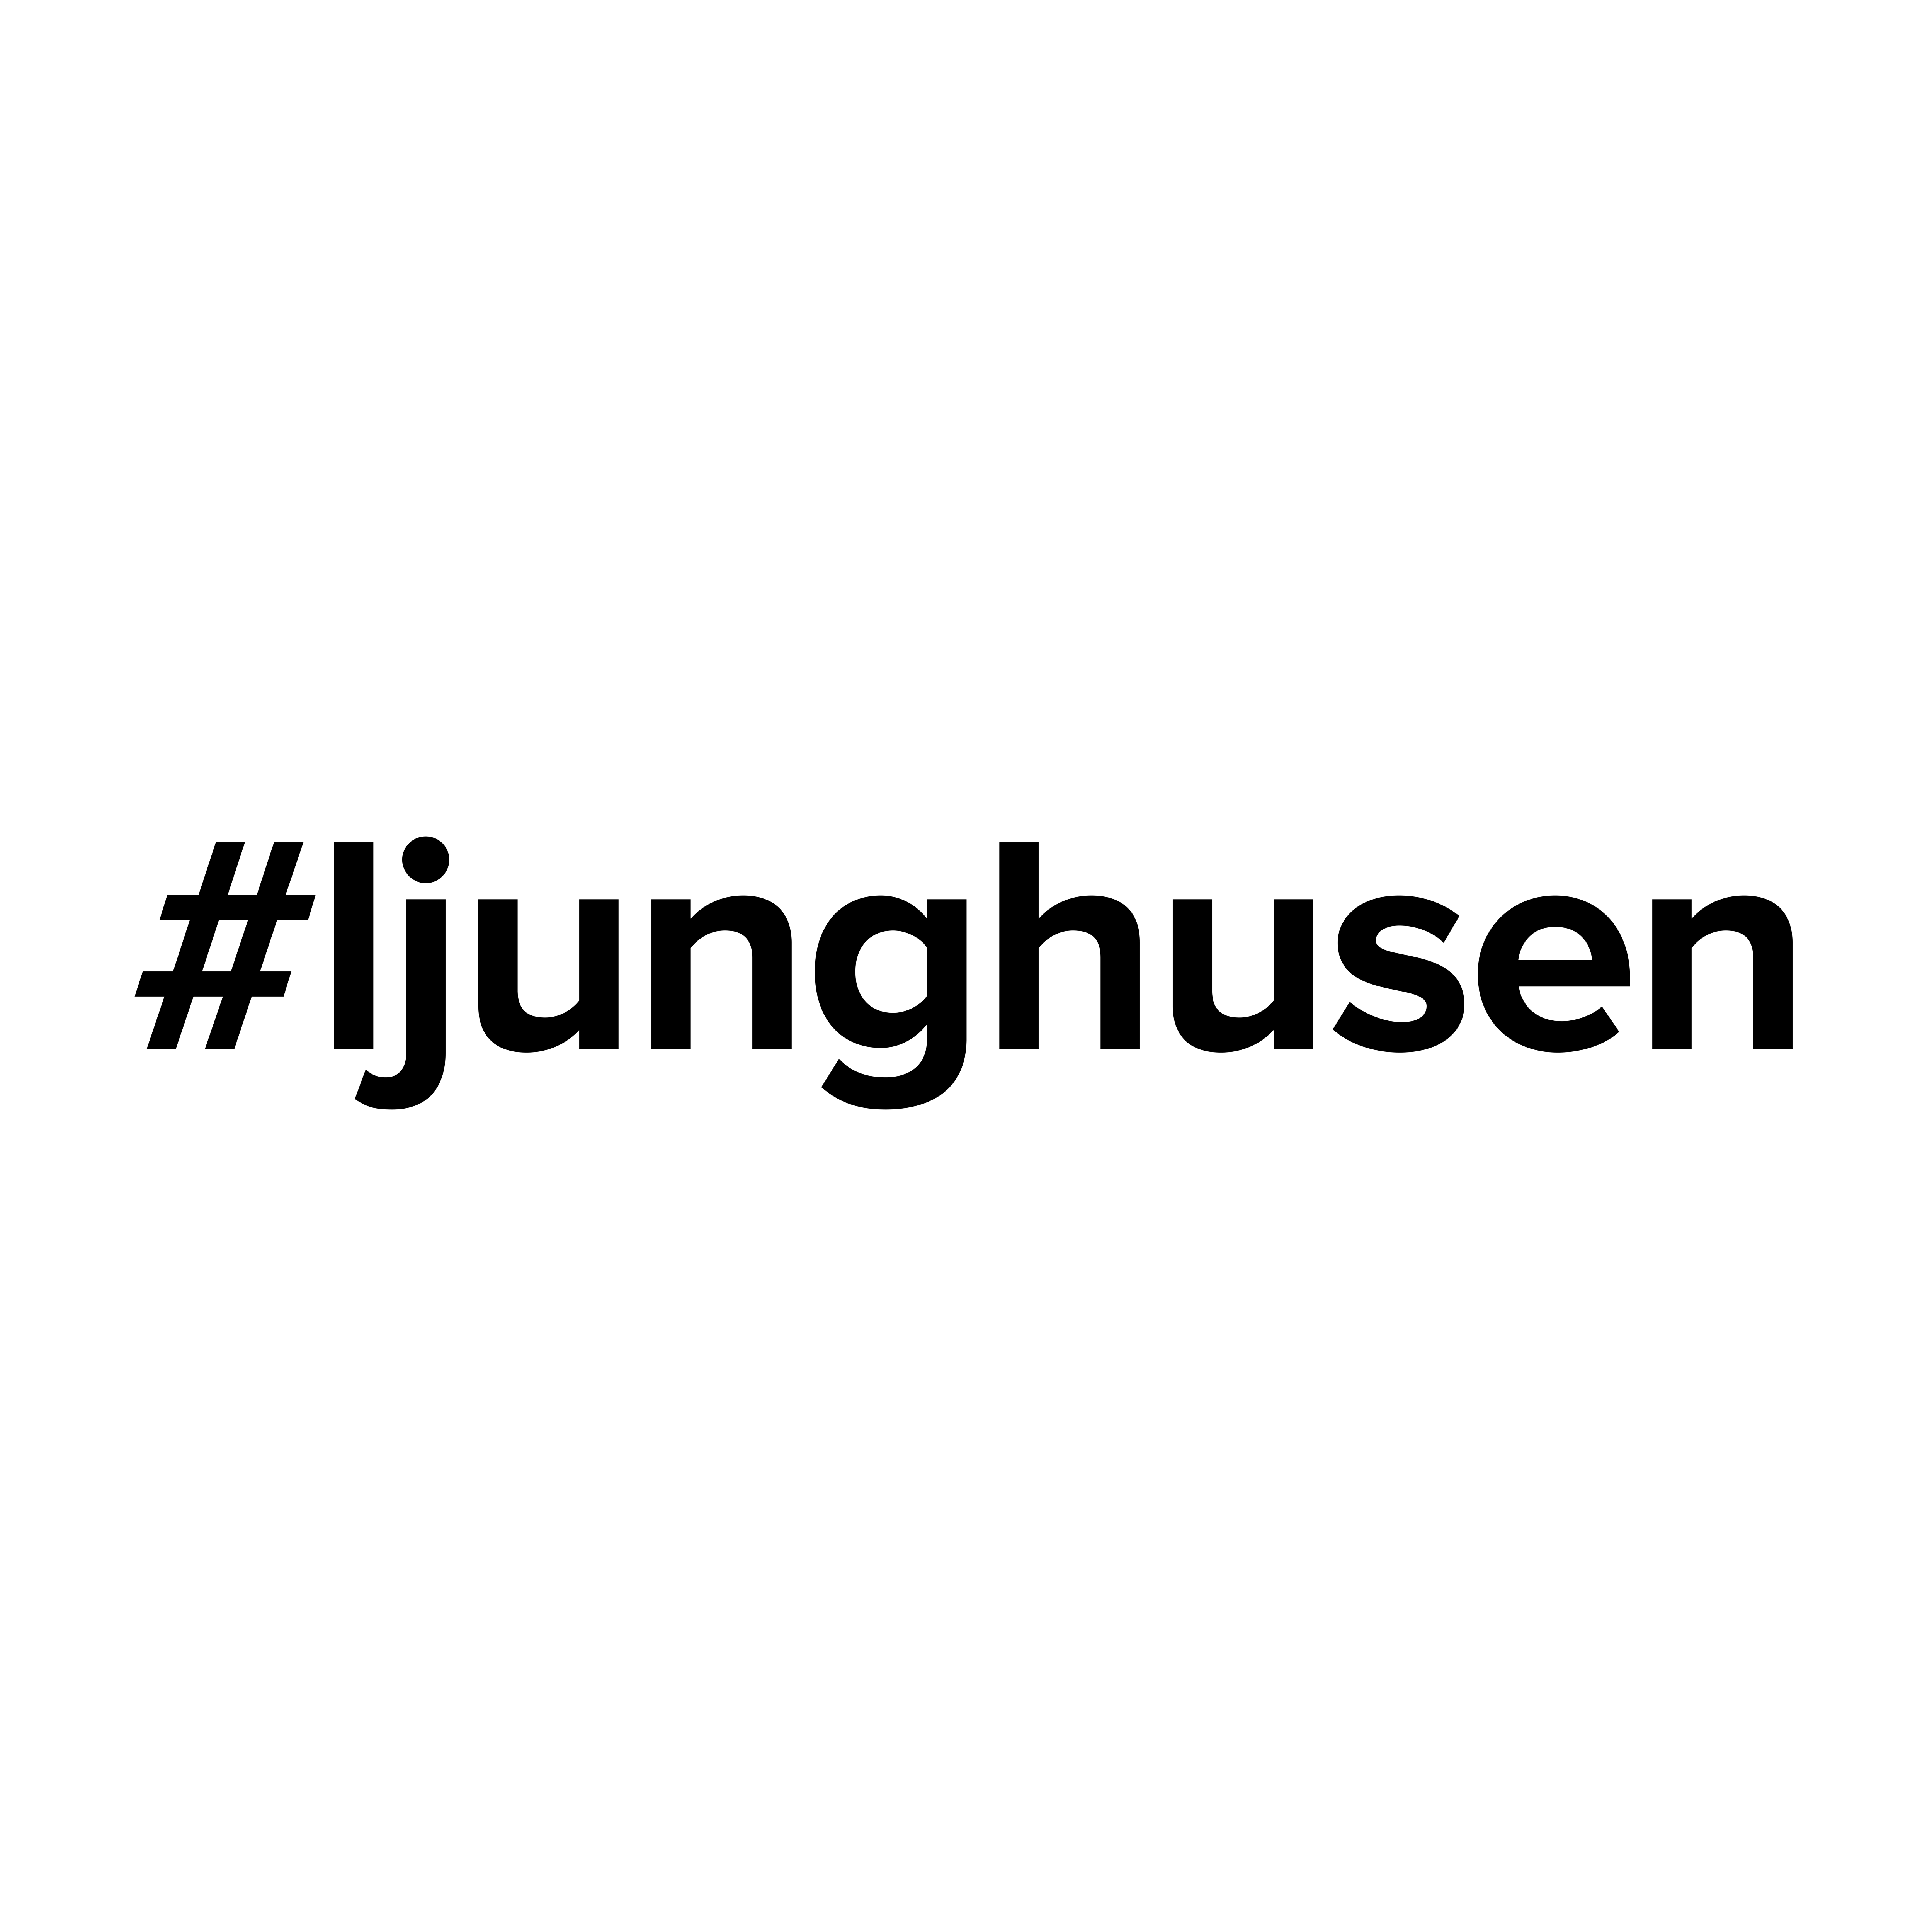 Logo #ljunghusen Ljunghusen @ljunghusen